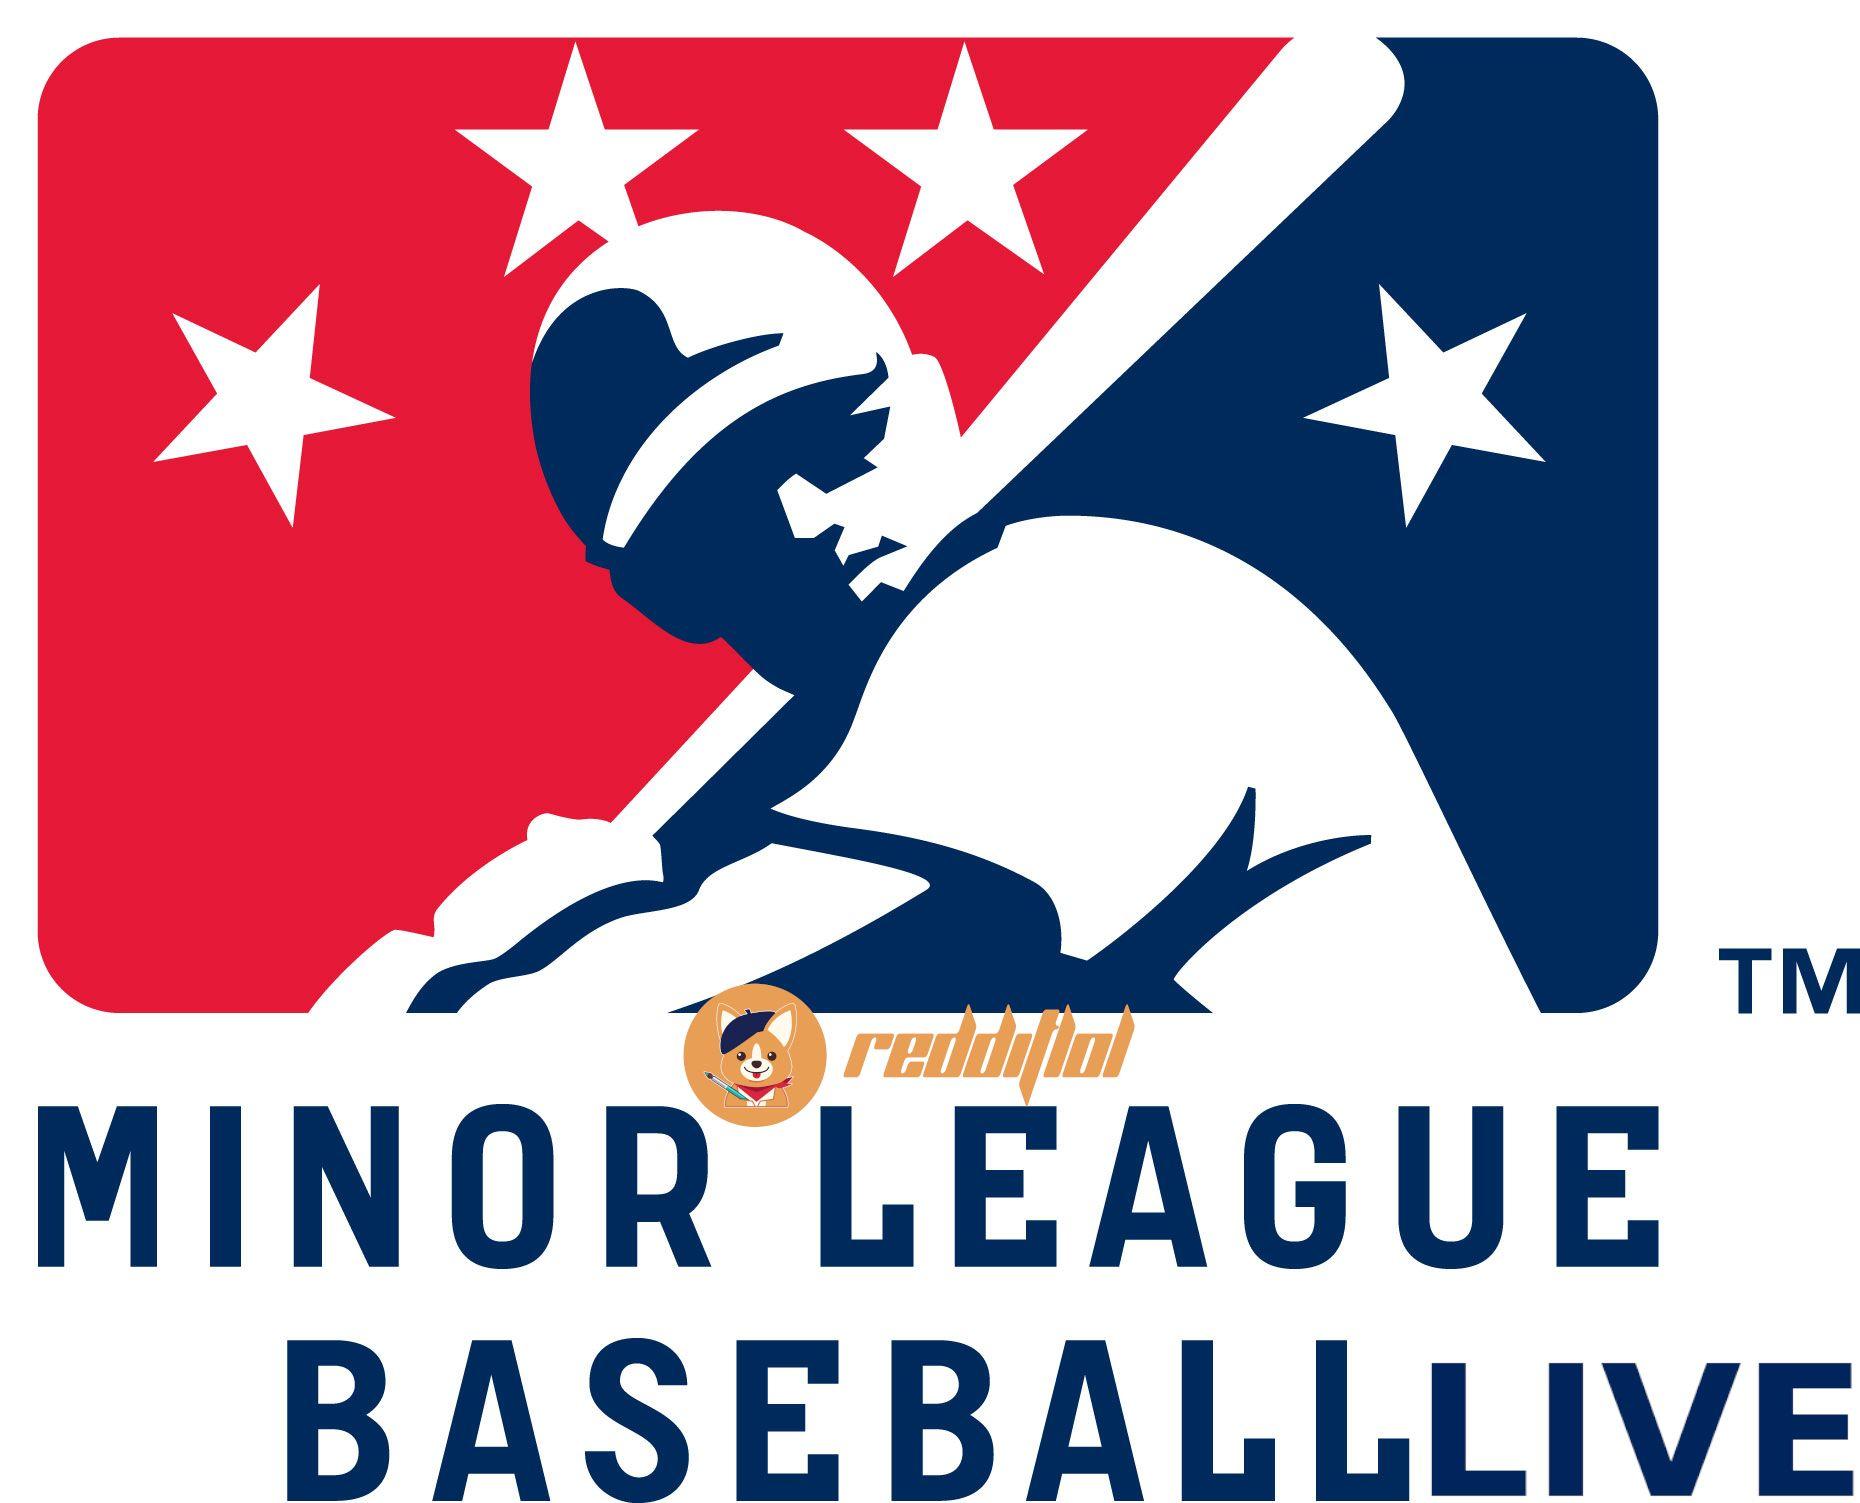 Huskies Vs Red Sox Mlb Streams Reddit 21 Feb 2020 Major League Baseball 2020 Reddit Mlb Streams Free In 2020 Baseball Teams Logo Minor League Baseball Baseball Team